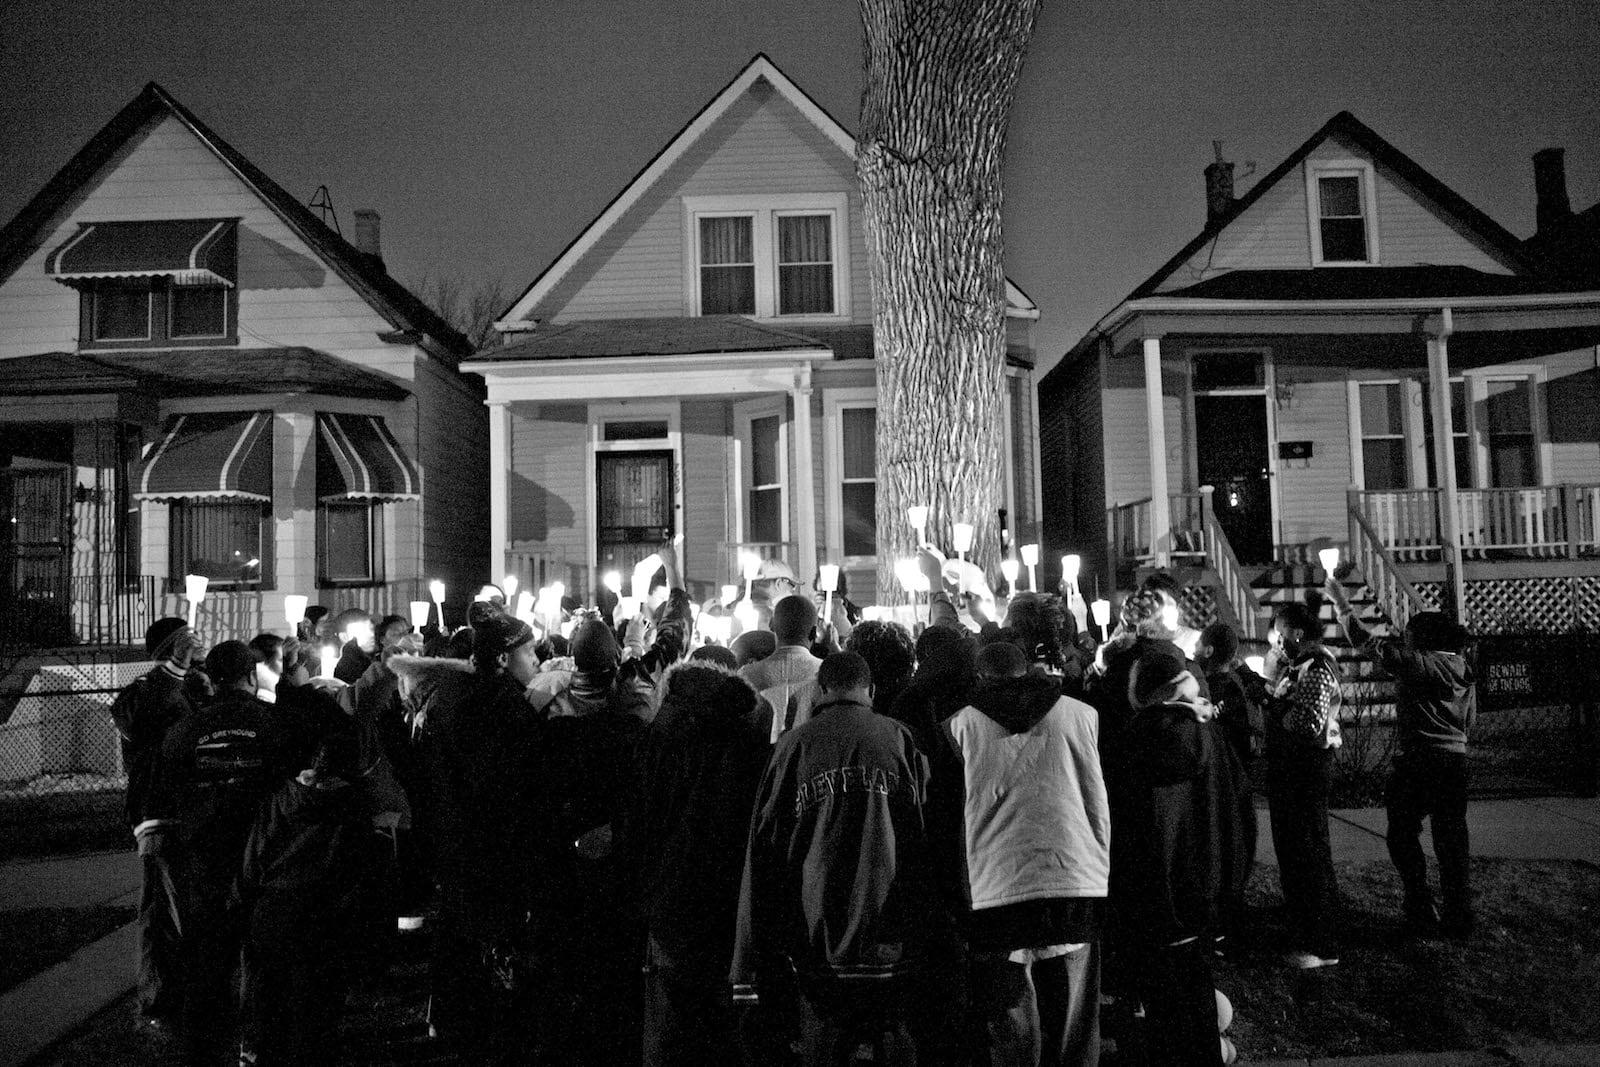 Carlos Javier Ortiz, Night Vigil, Englewood, Chicago, 2008